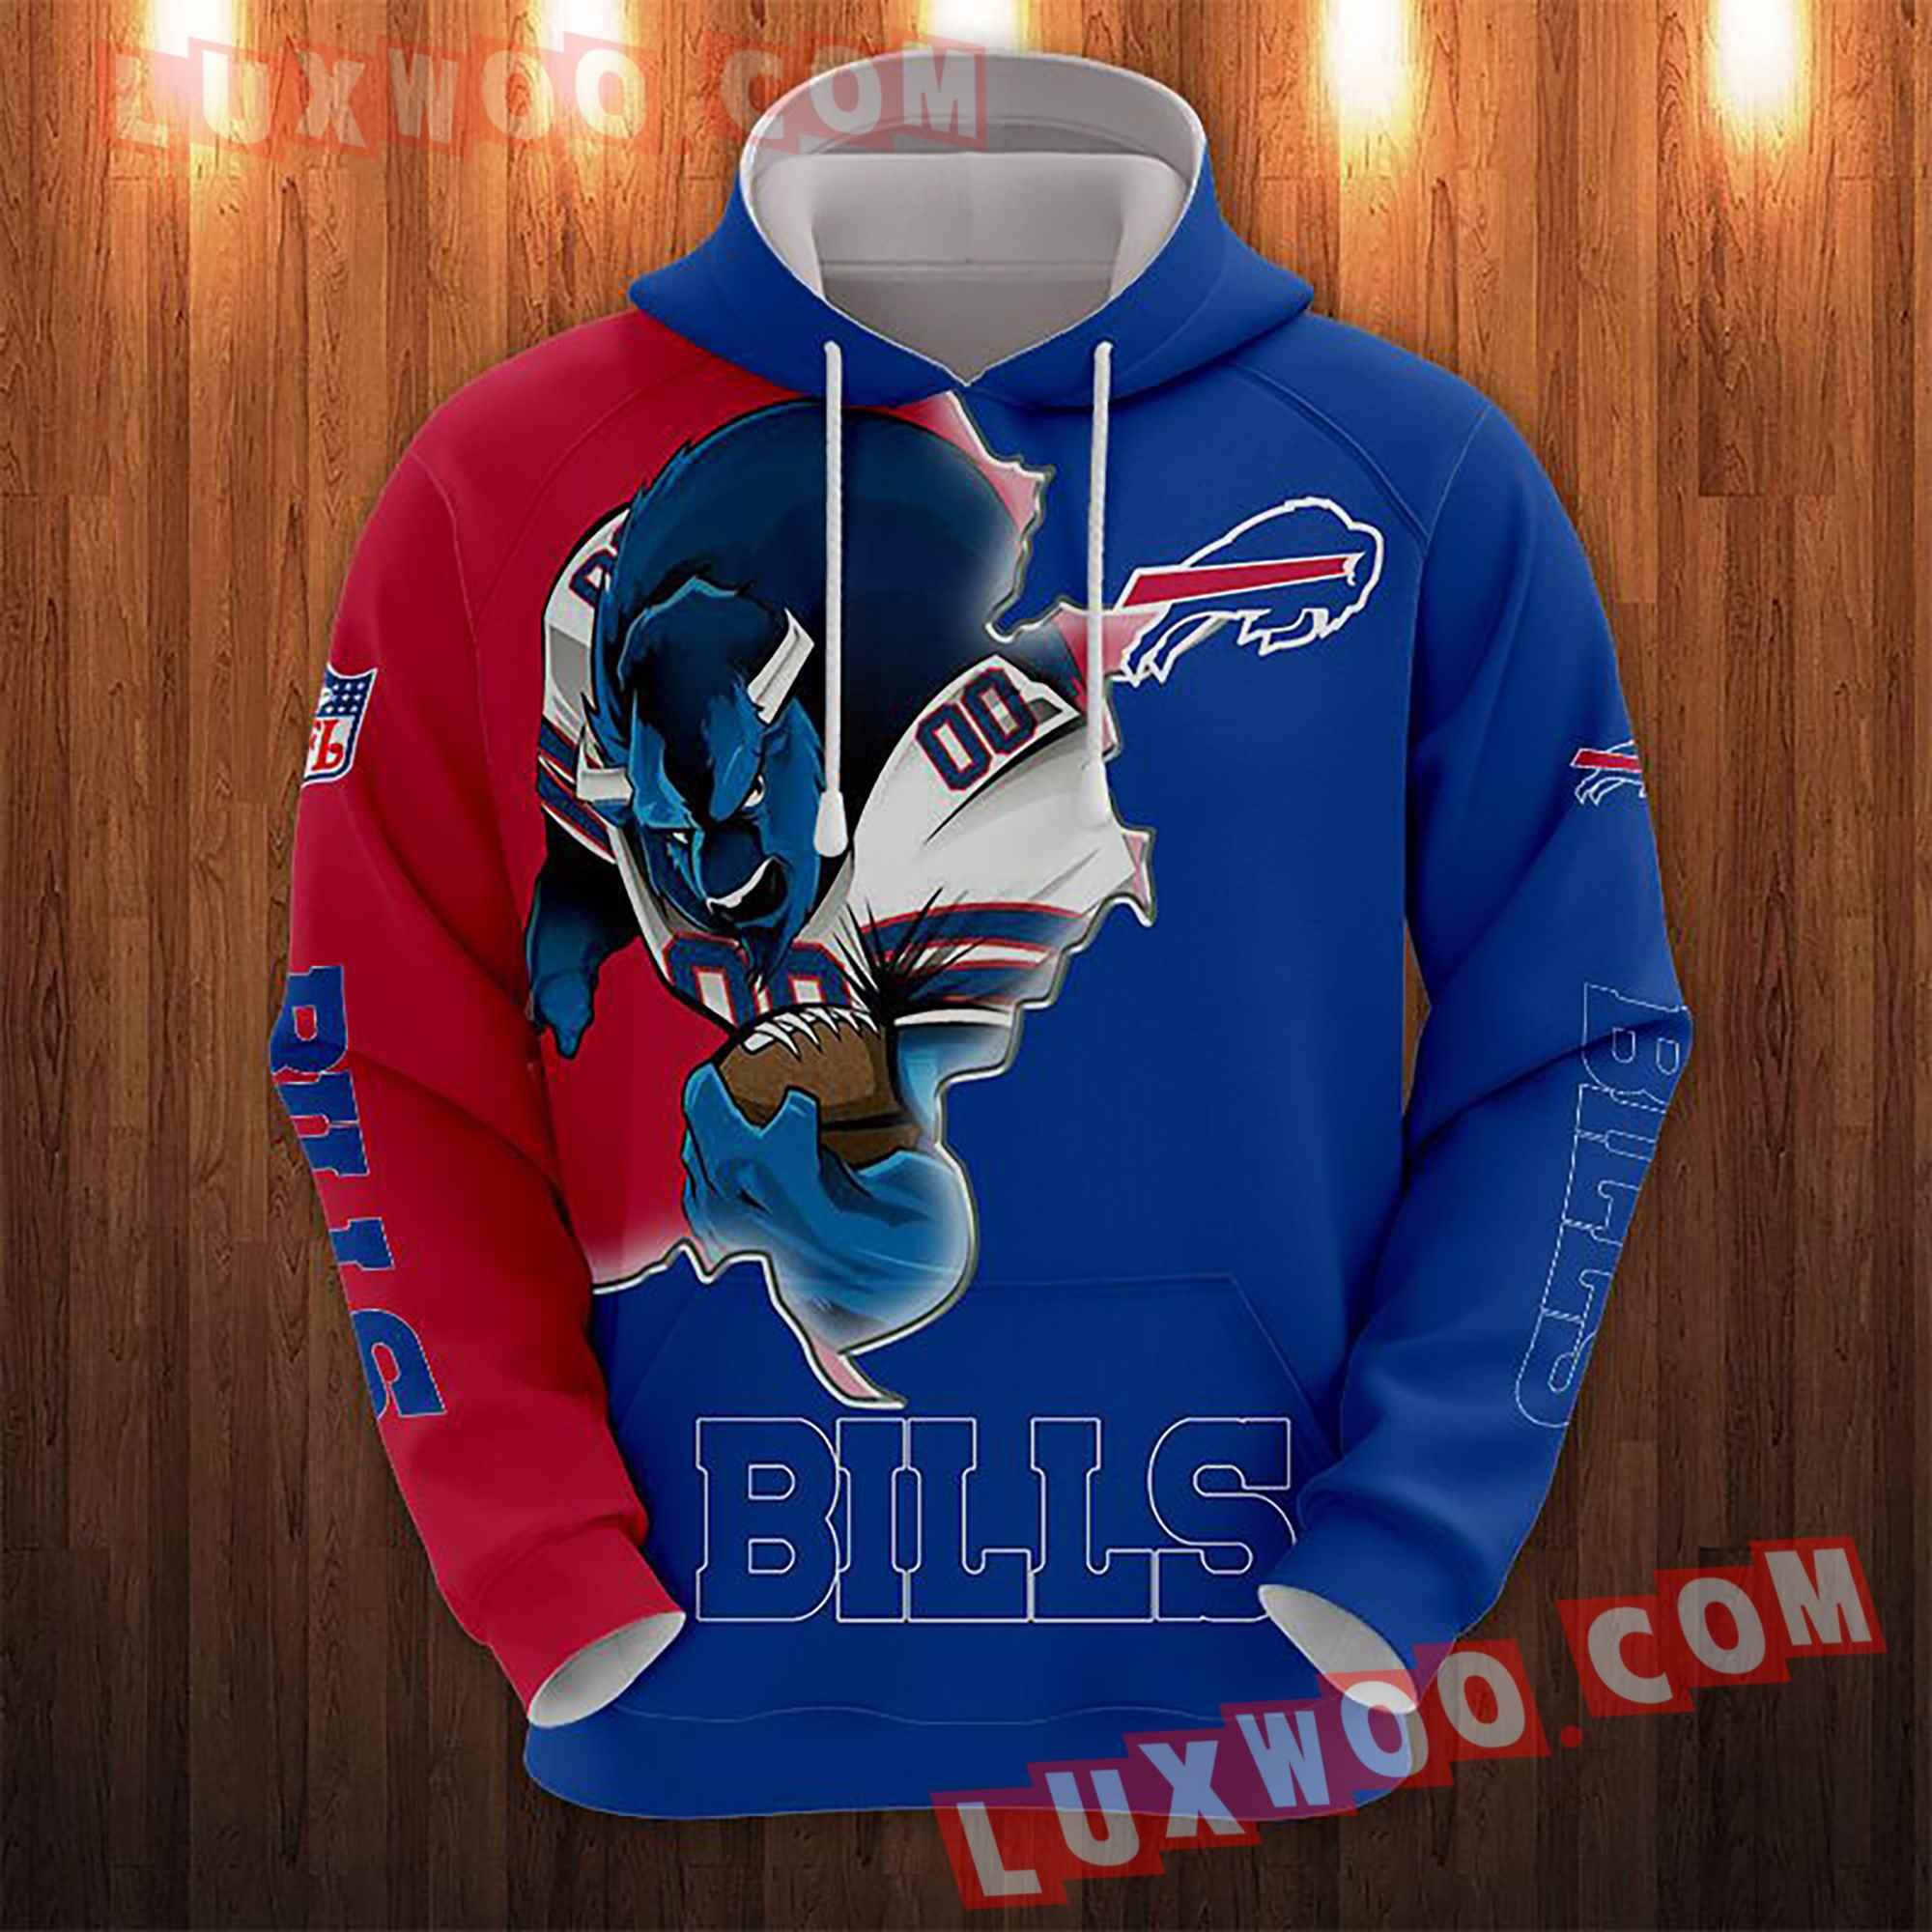 Nfl Buffalo Bills Hoodies Custom All Over Print 3d Pullover Hoodie V6